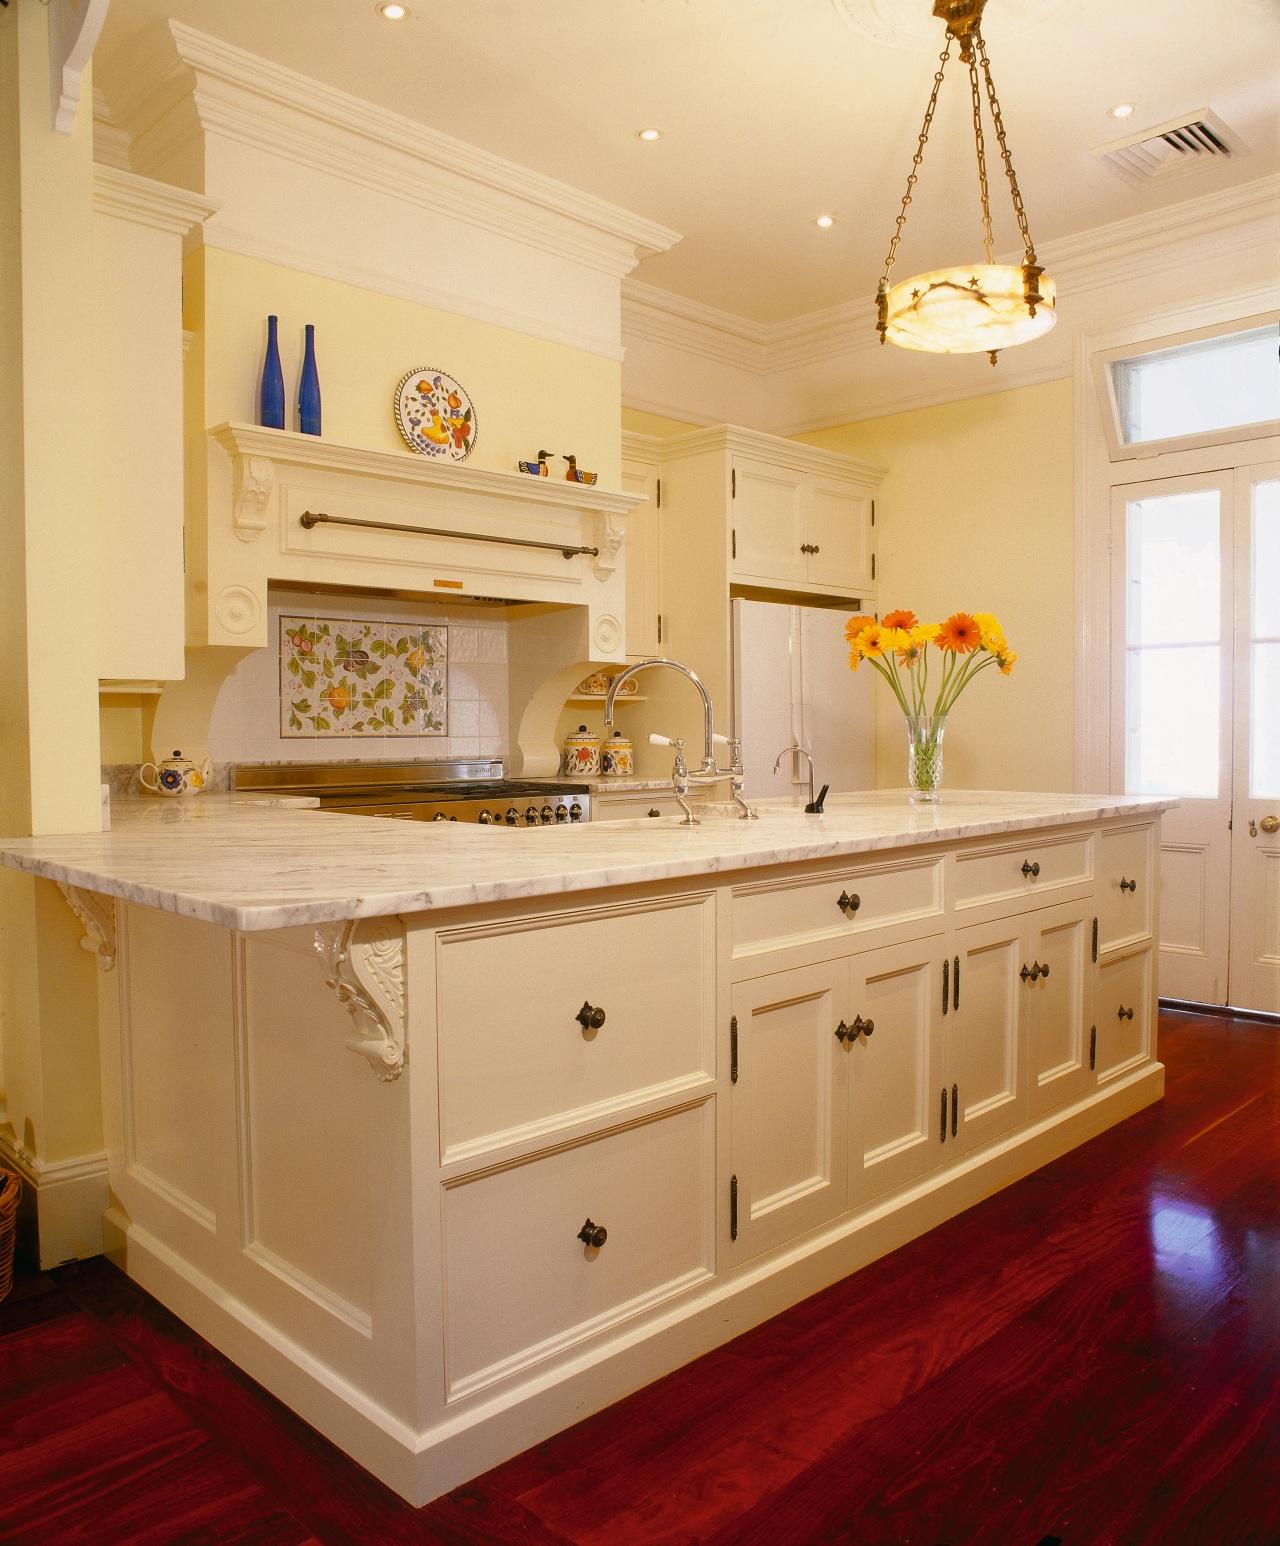 view of the one off custom designed kitchen cabinetry, ceiling, countertop, cuisine classique, floor, flooring, home, interior design, kitchen, room, sink, orange